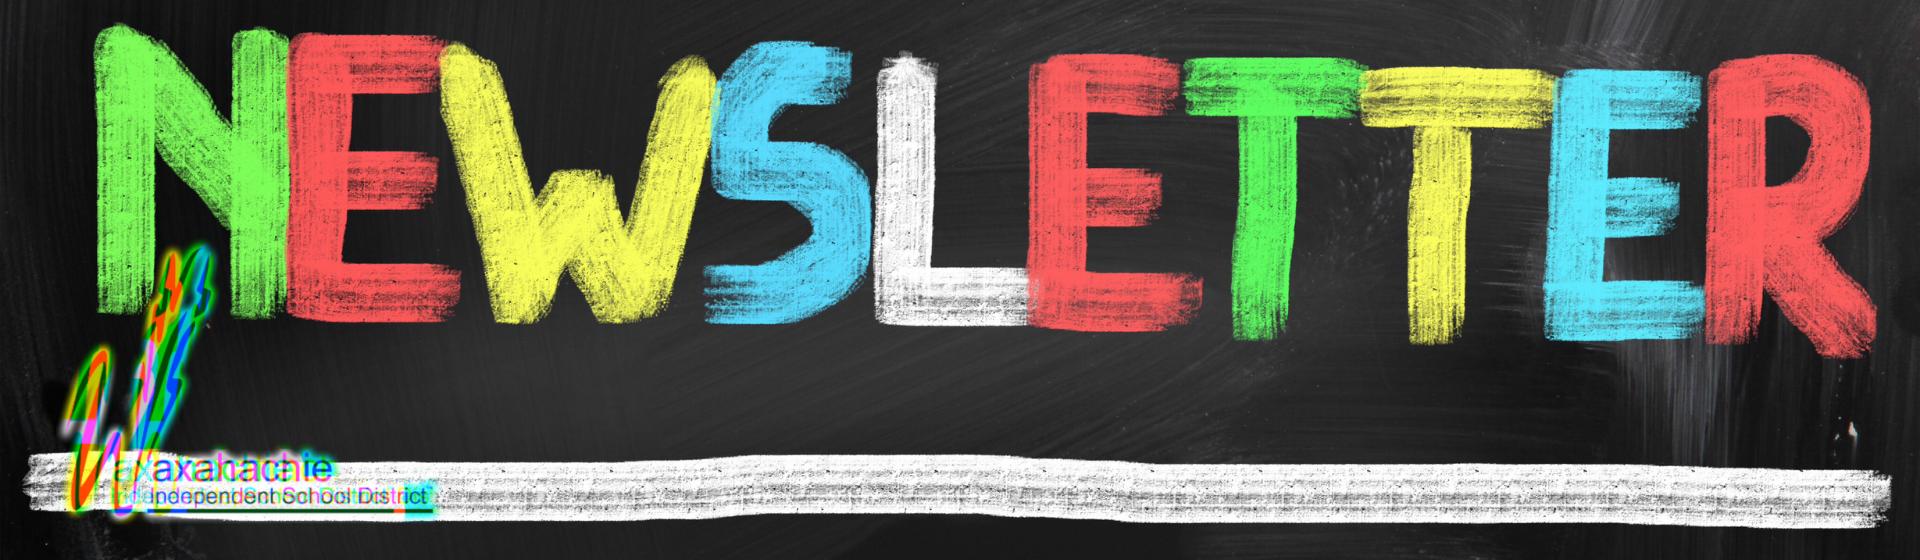 newsletter written in colorful chalk